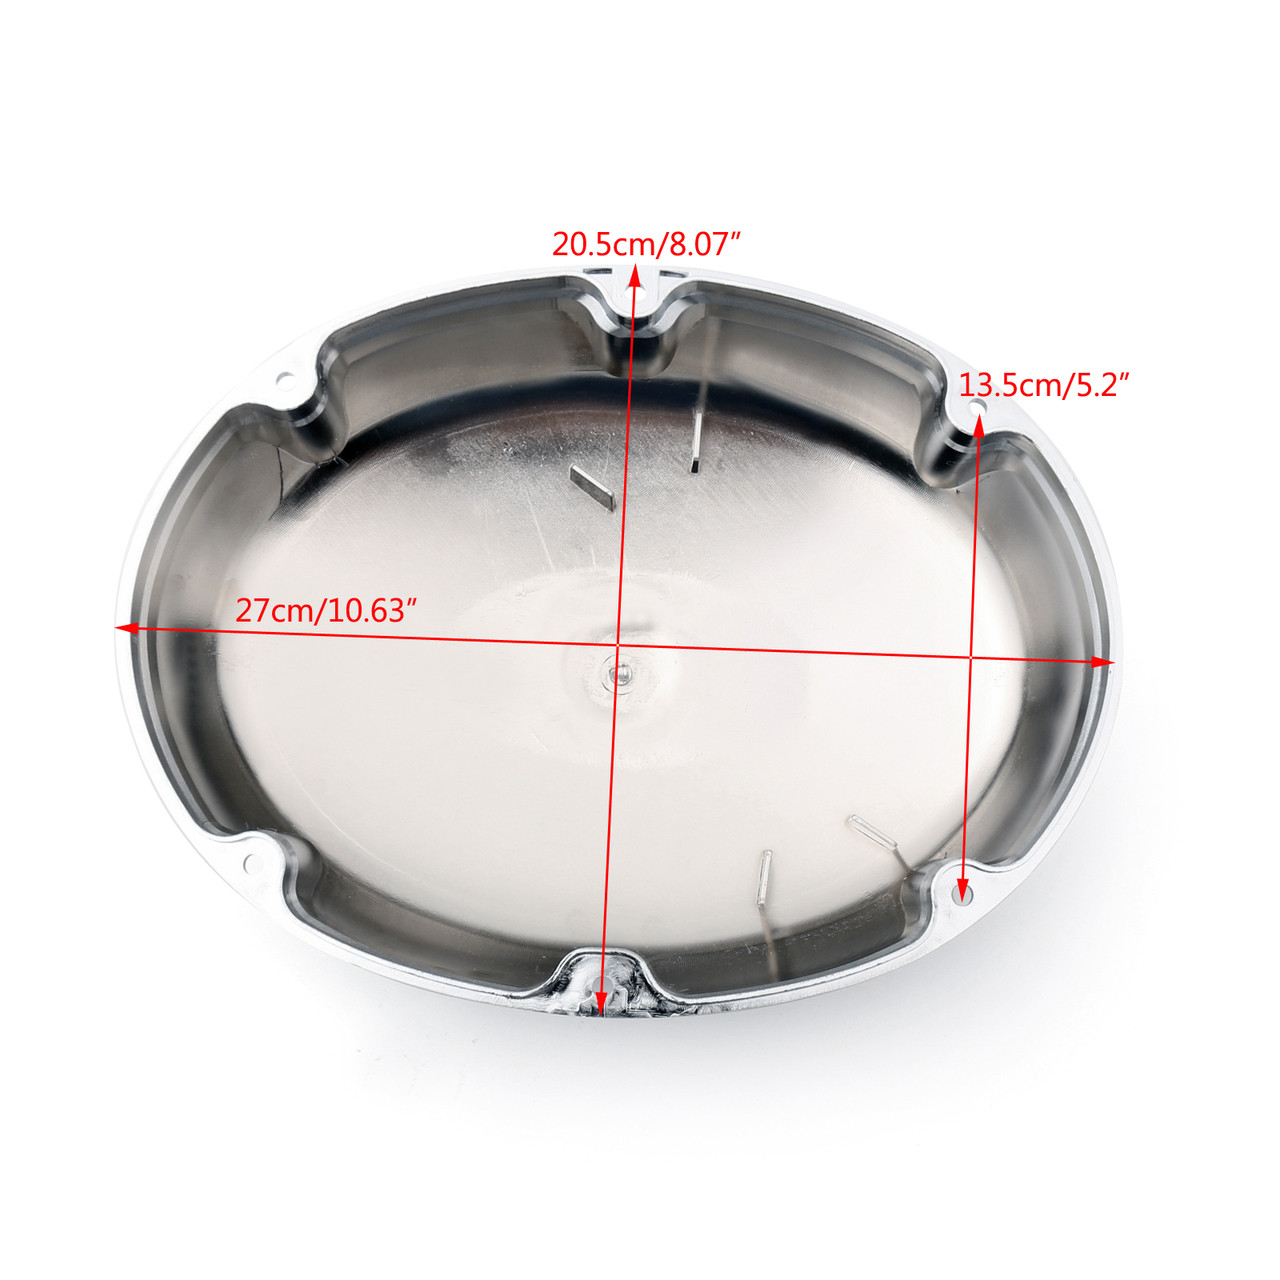 Chrome Air Intake Filter Cleaner Cover For Honda Shadow ACE VT400 VT750 97-03 Chrome